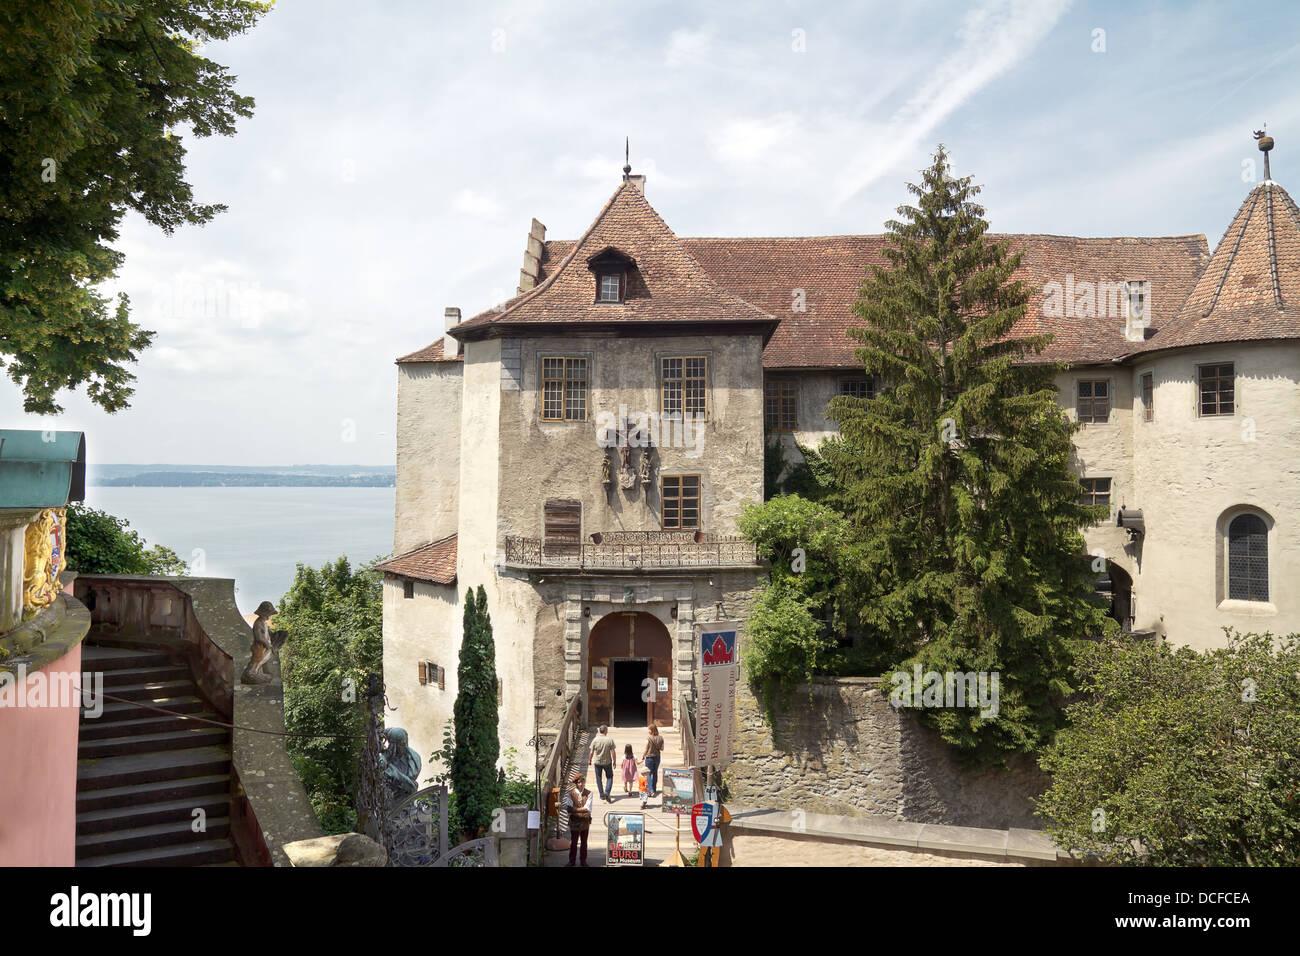 Meersburg Castle, Bodensee district, Baden-Wuerttemberg, Germany, Europe Stock Photo